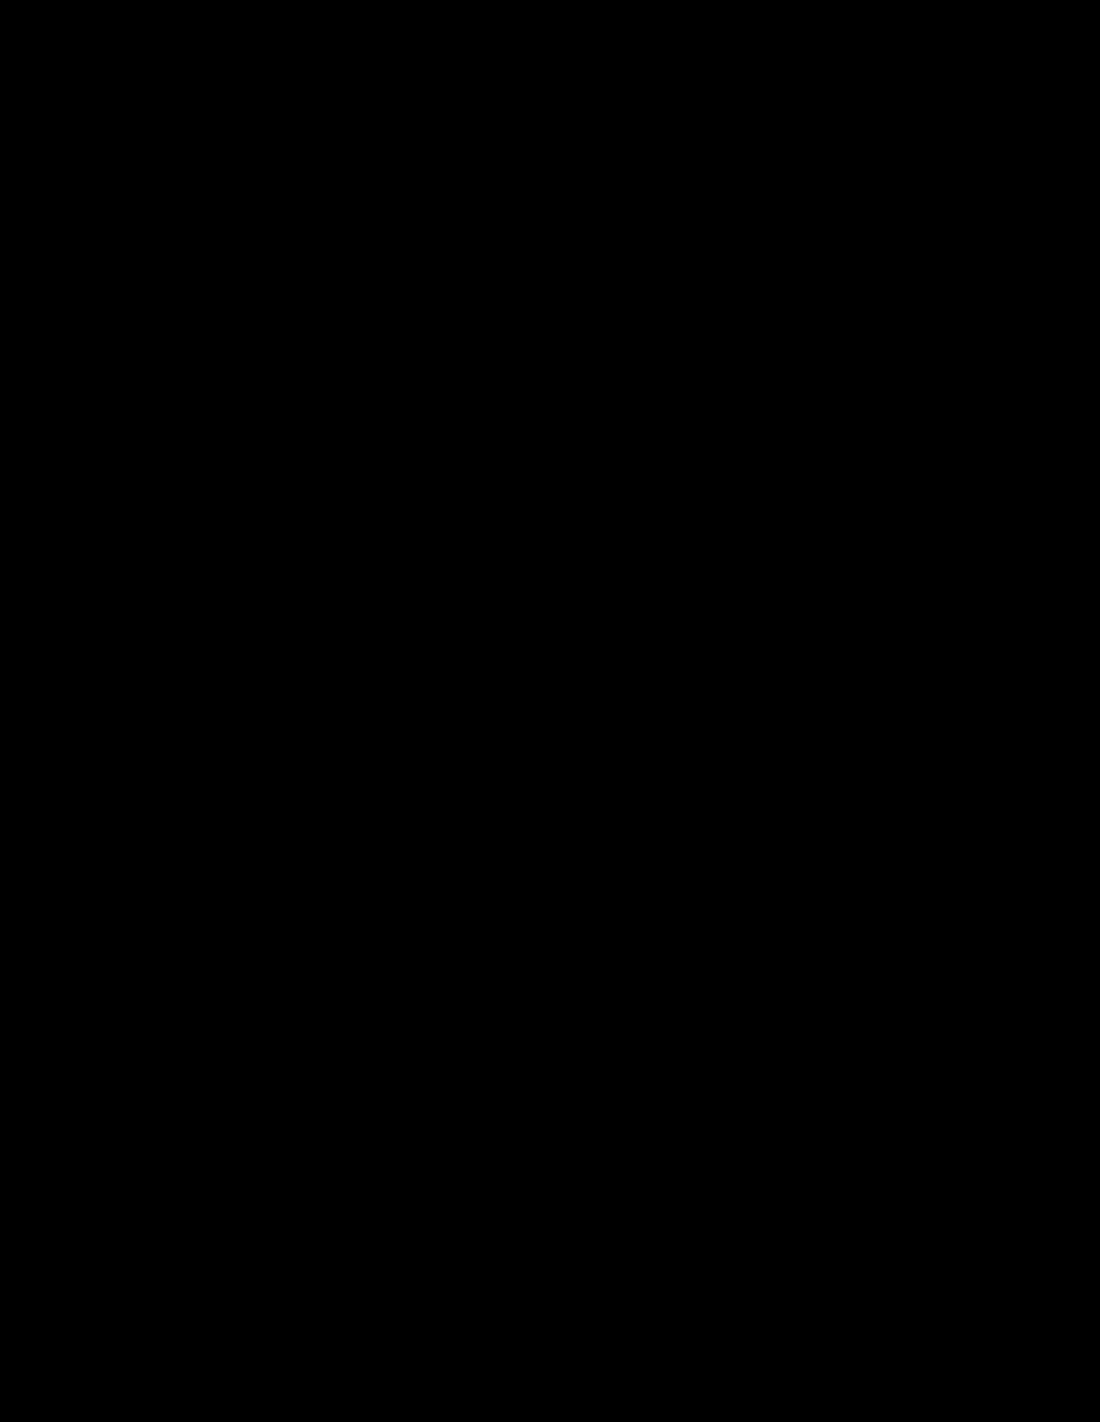 EVSTORE